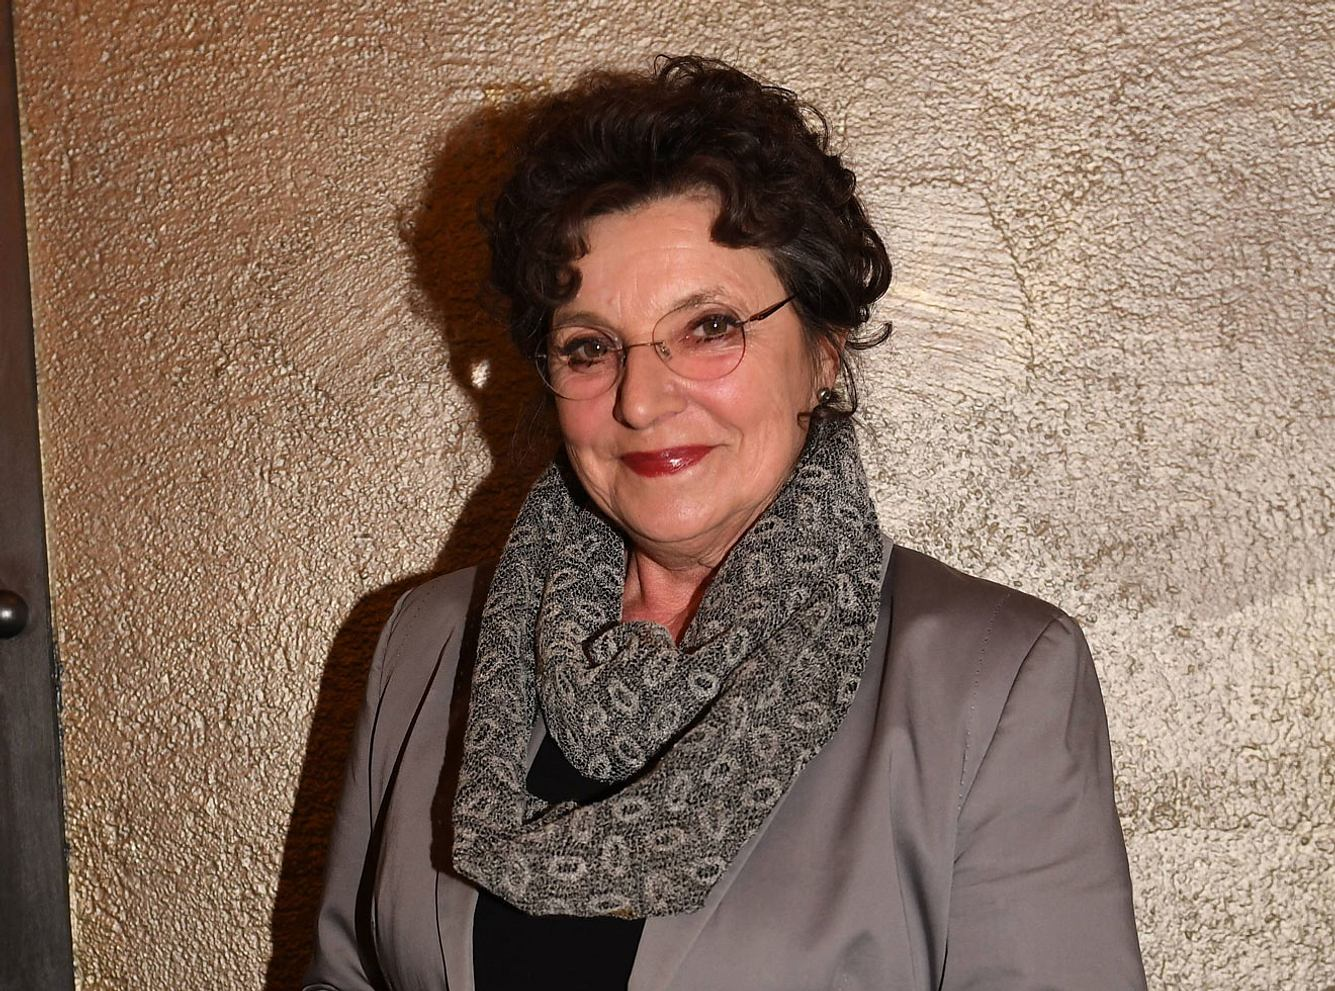 Schauspielerin Monika Baumgartner.